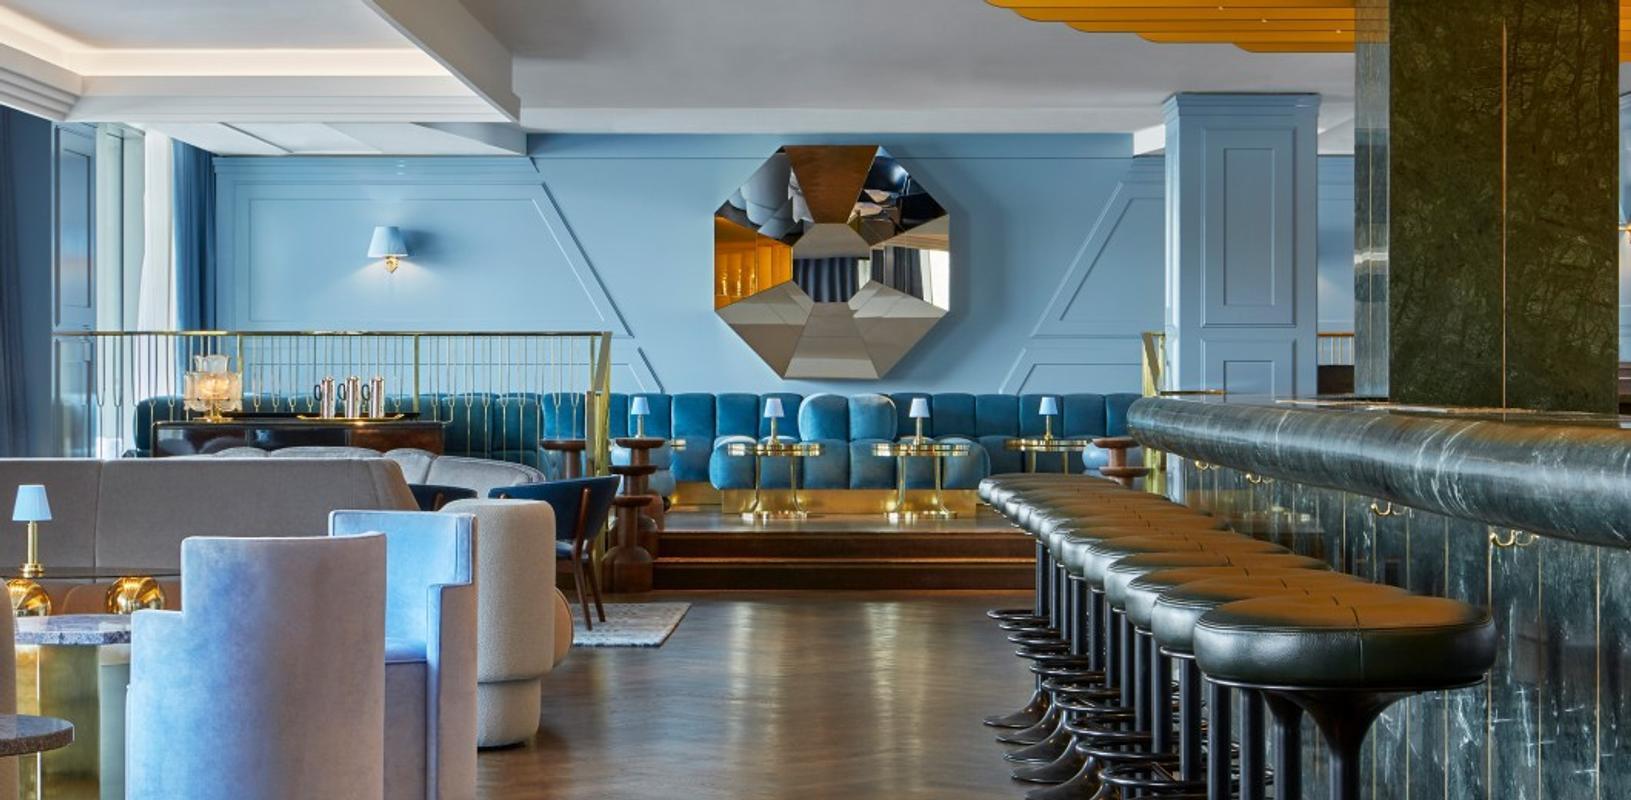 Best Bars In Waterloo London